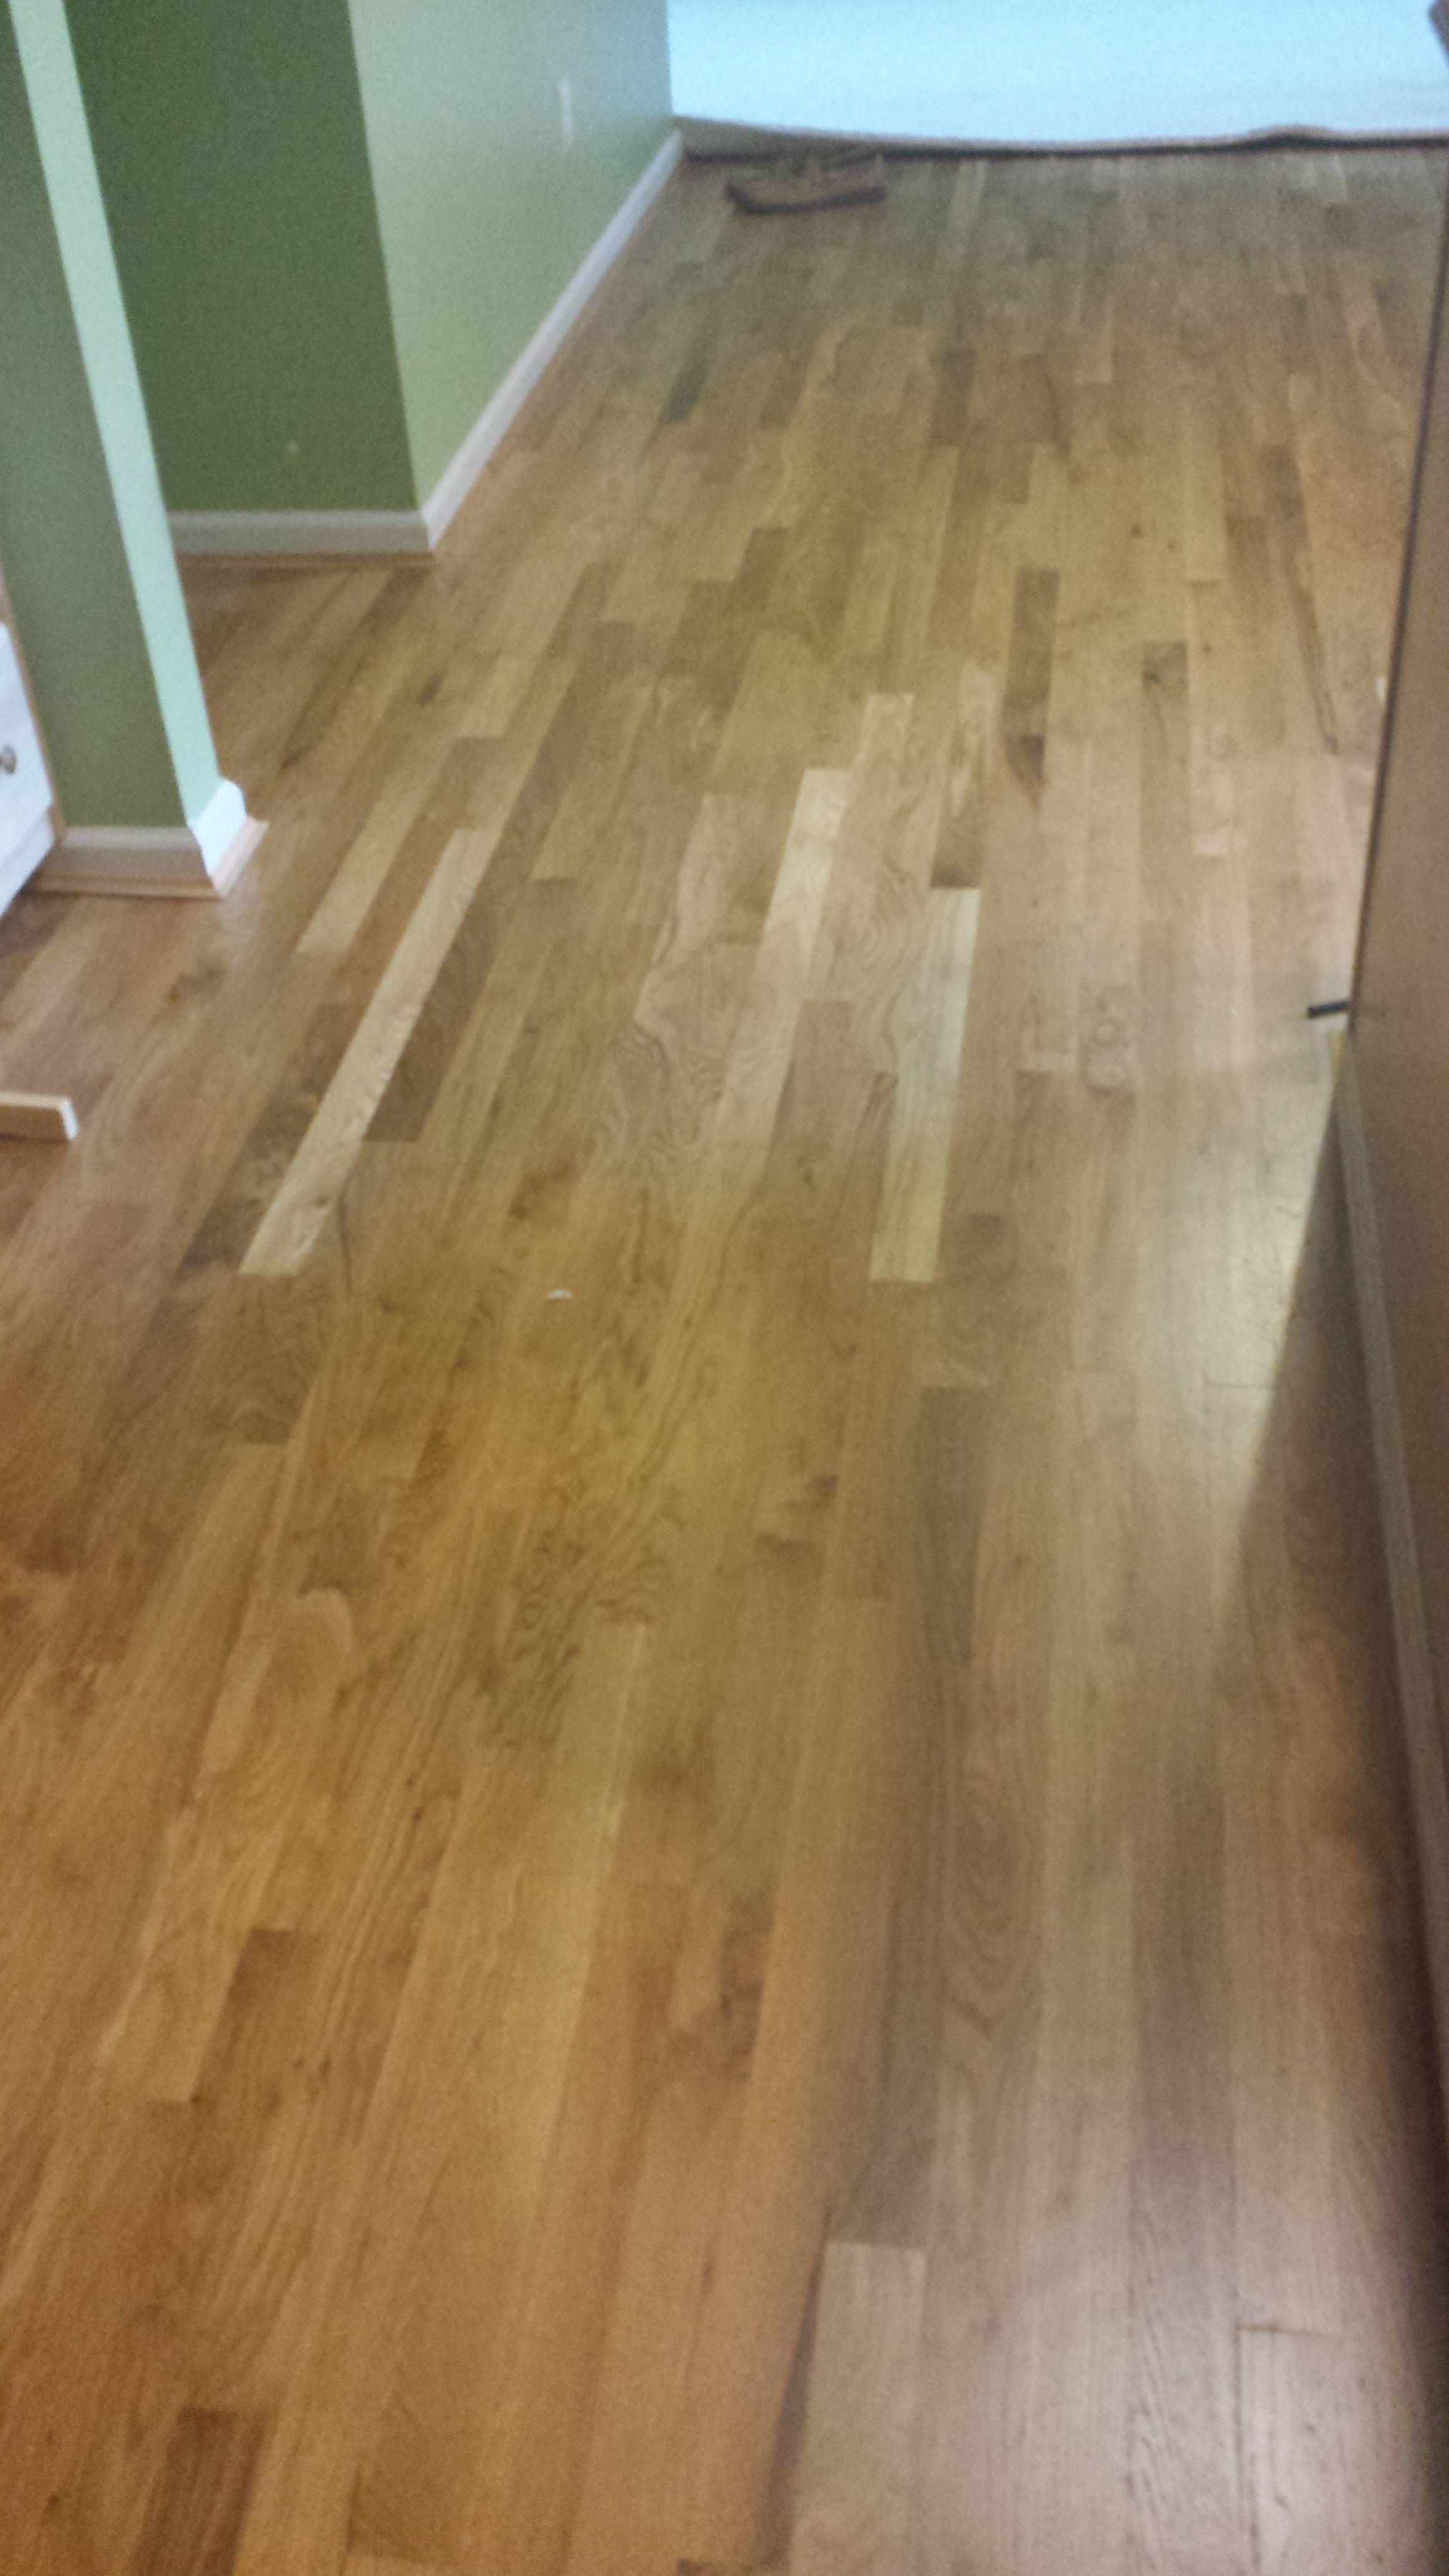 New 2 1 4 Unfinished Strip Flooring Sanded Stained Golden Oak And Urethane Mason Ohio 45040 Oil Based Flooring Sale Hardwood Floors Strip Floors